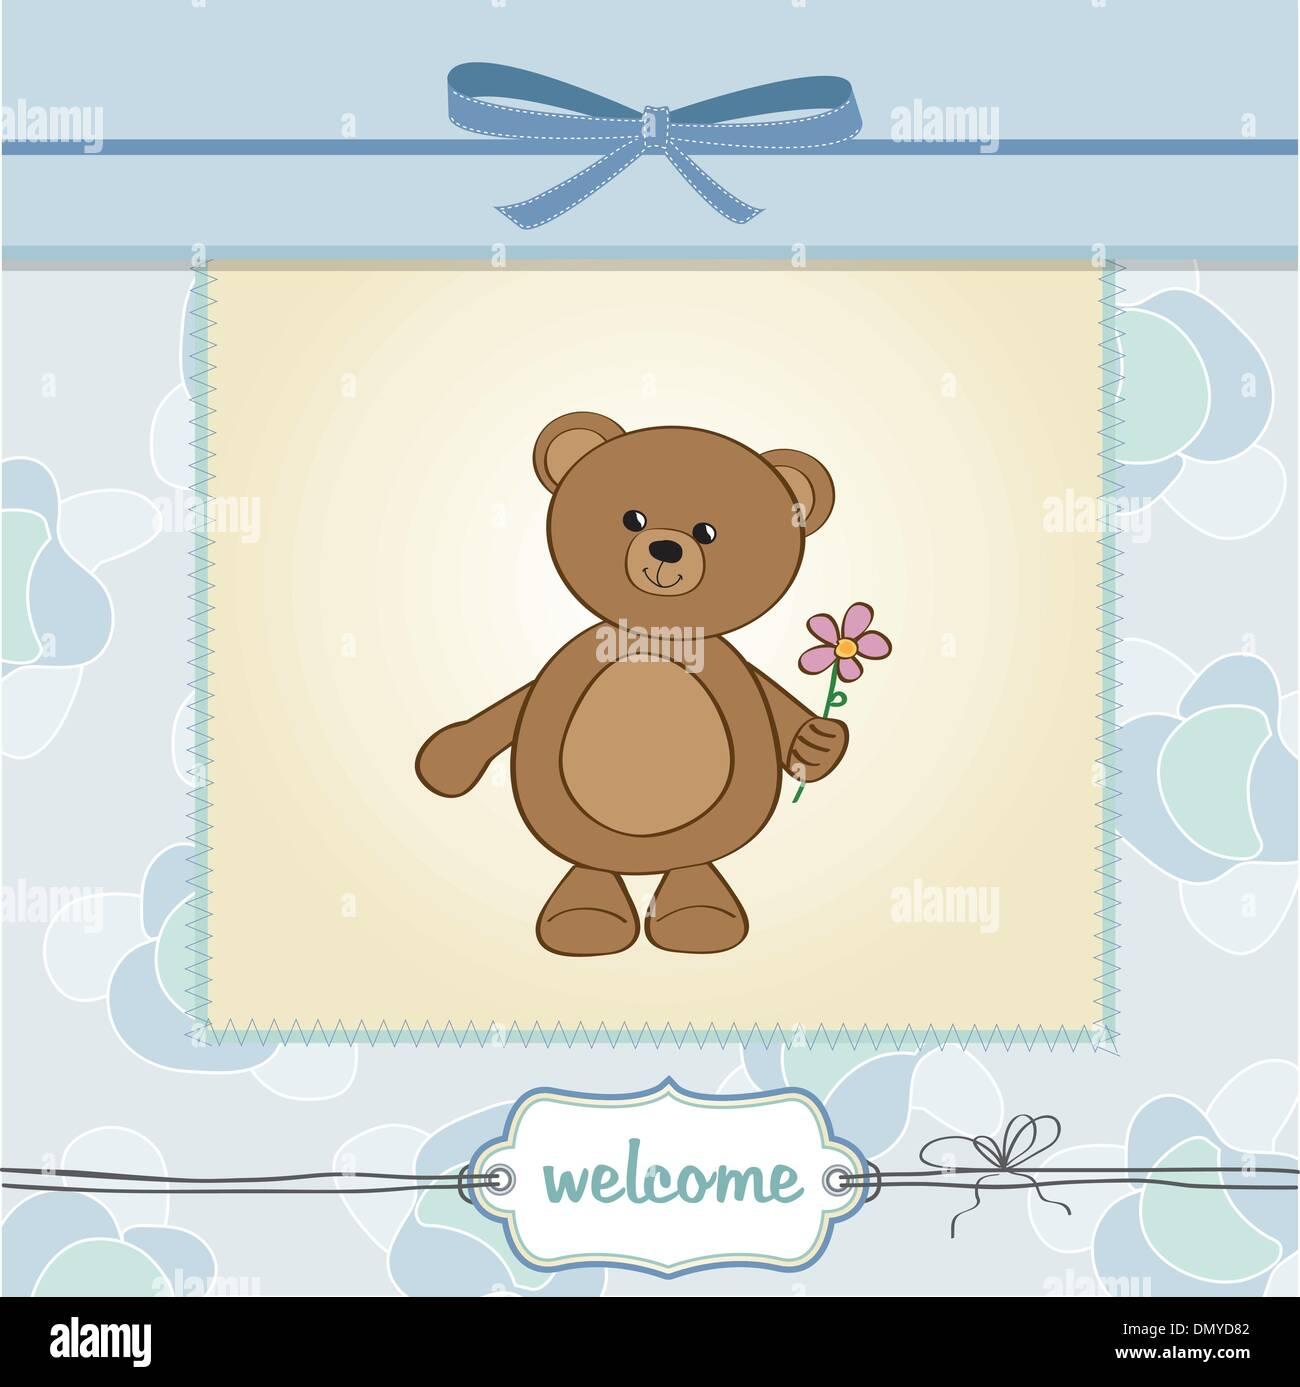 Happy Birthday Card With Teddy Bear And Flower Stock Vector Art